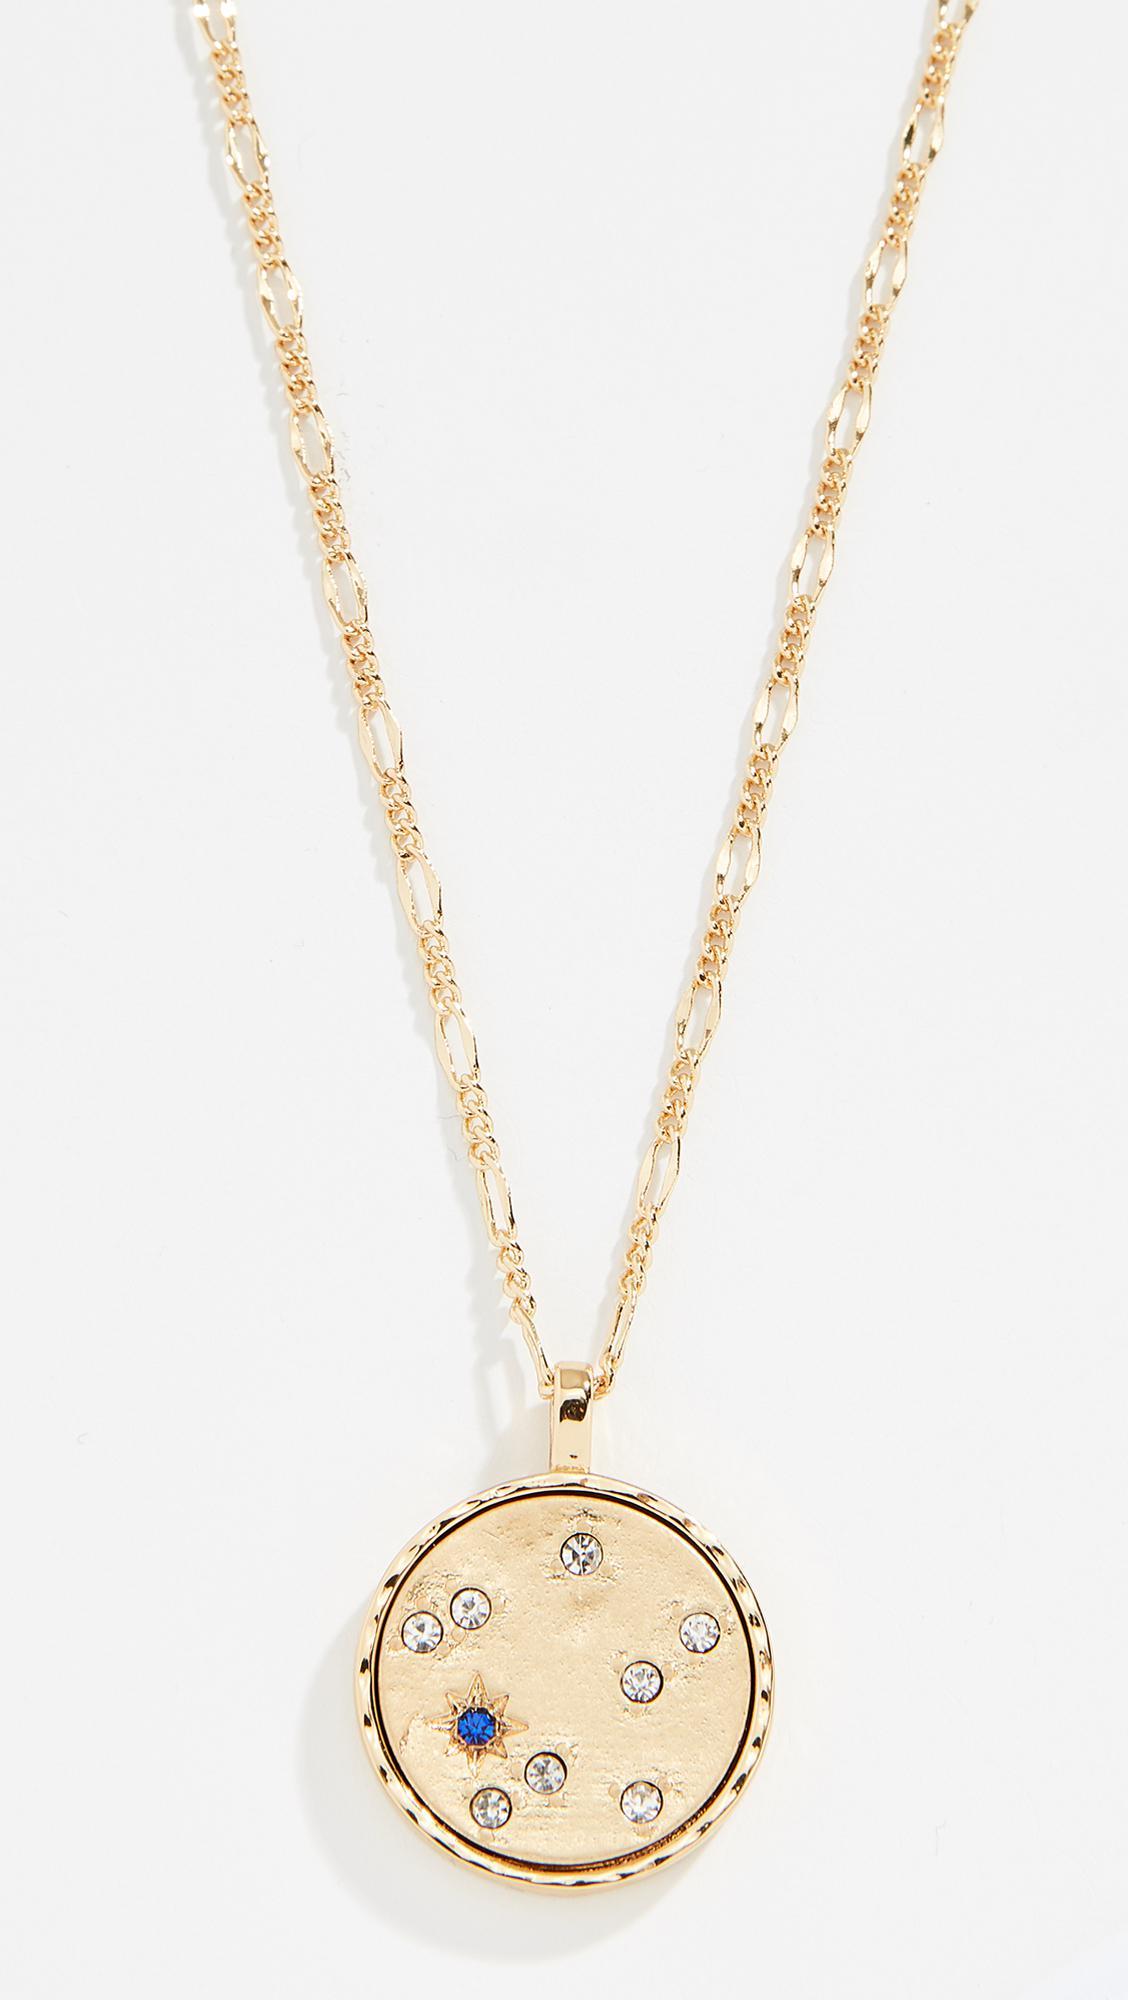 94938b7175440 ... real baublebar. womens metallic september pandora pendant necklace  d8d51 5c4cb